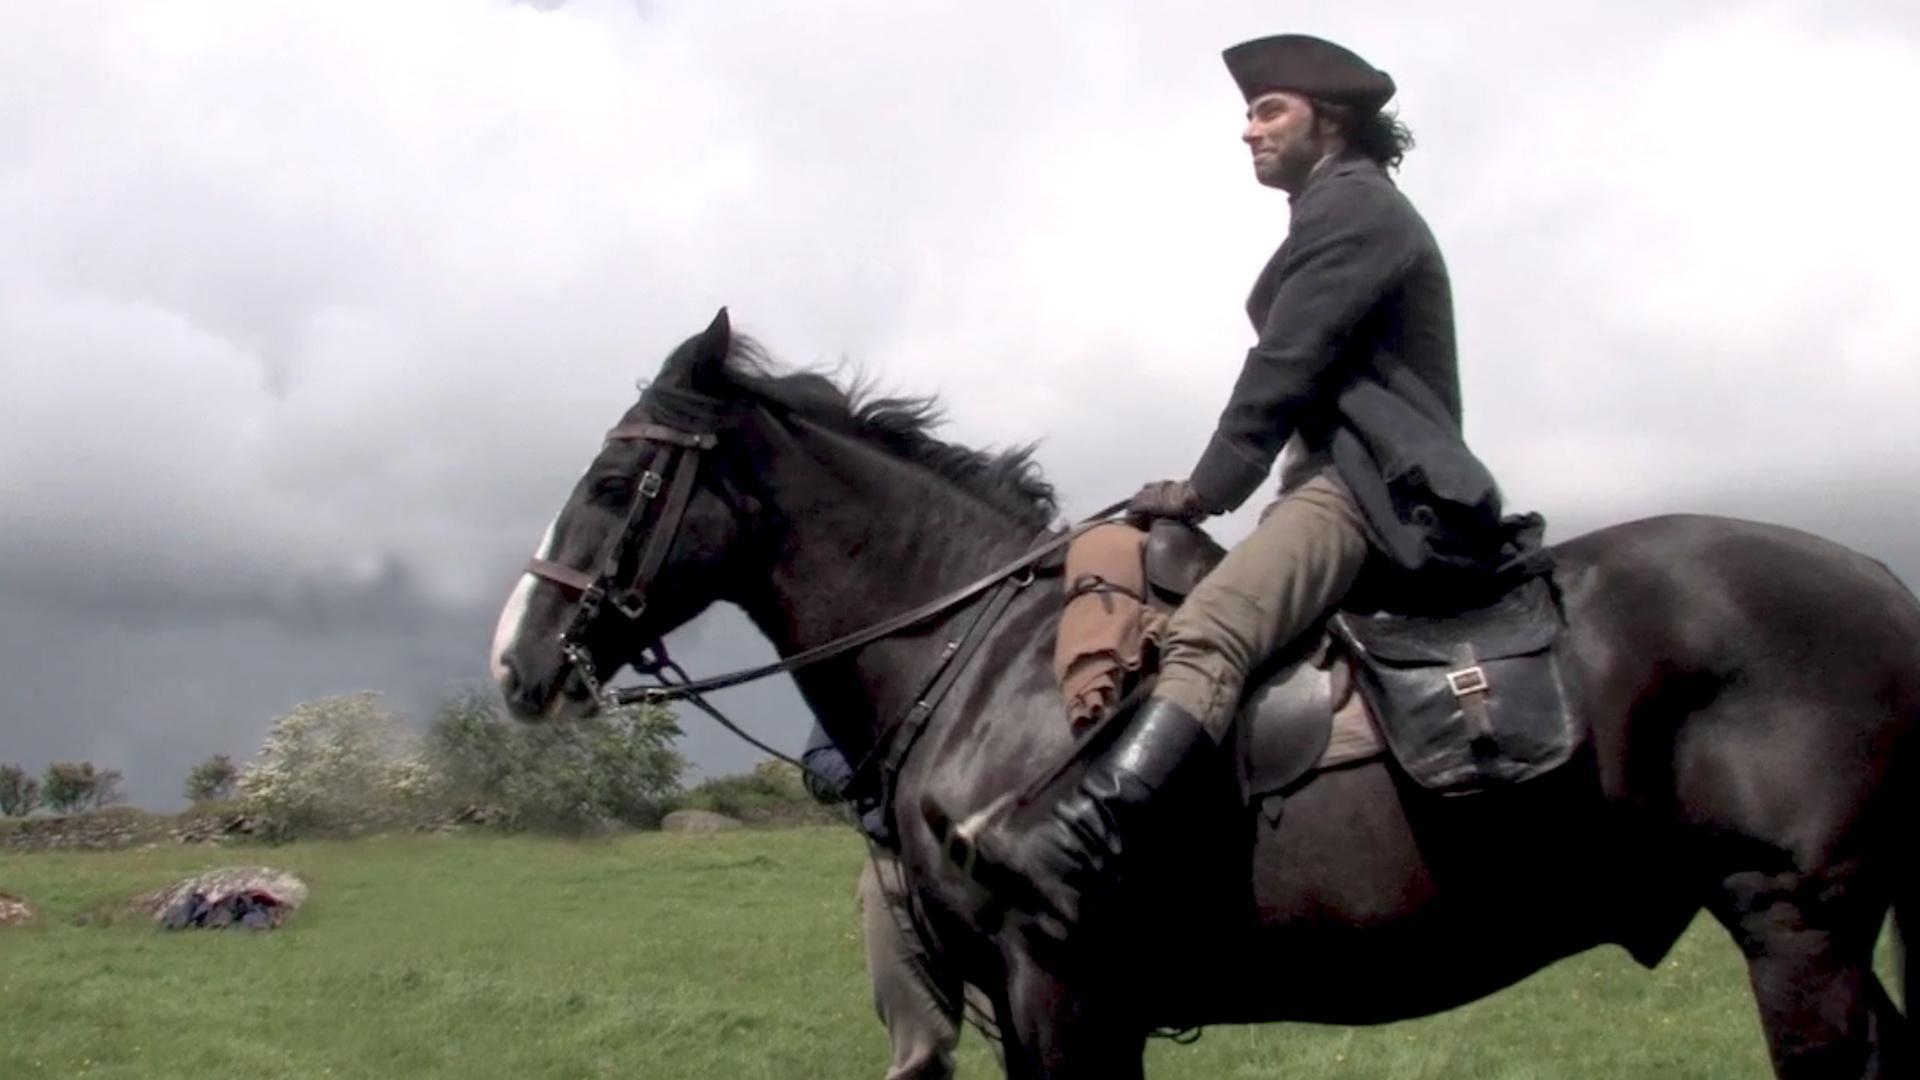 Poldark: Riding Through Cornwall